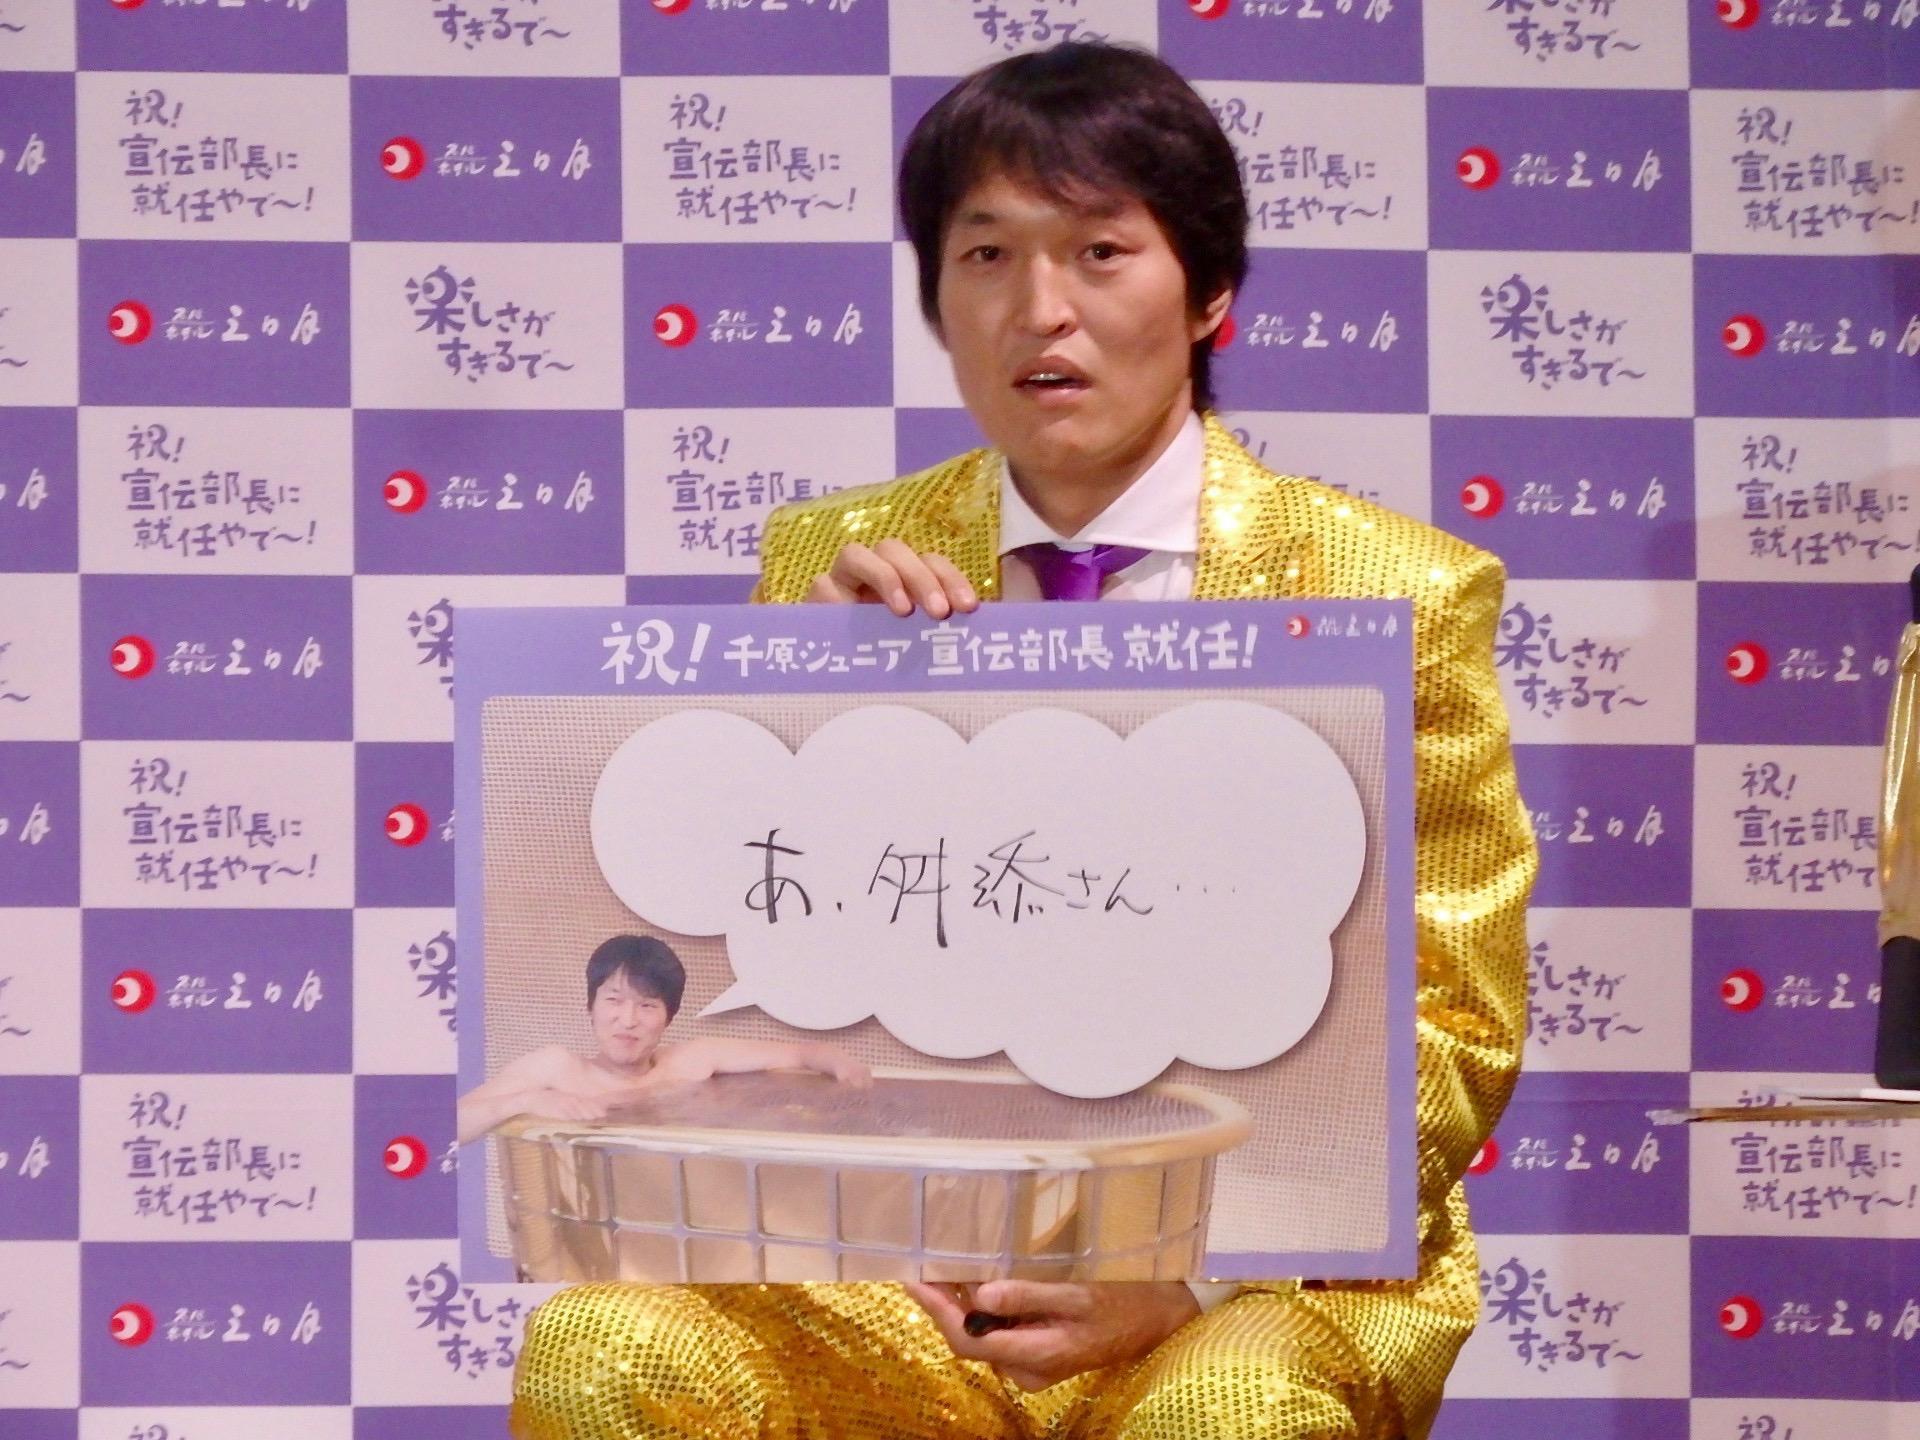 http://news.yoshimoto.co.jp/20180628202830-86902361a0bd19ab7732656f24e52577de8e1538.jpg